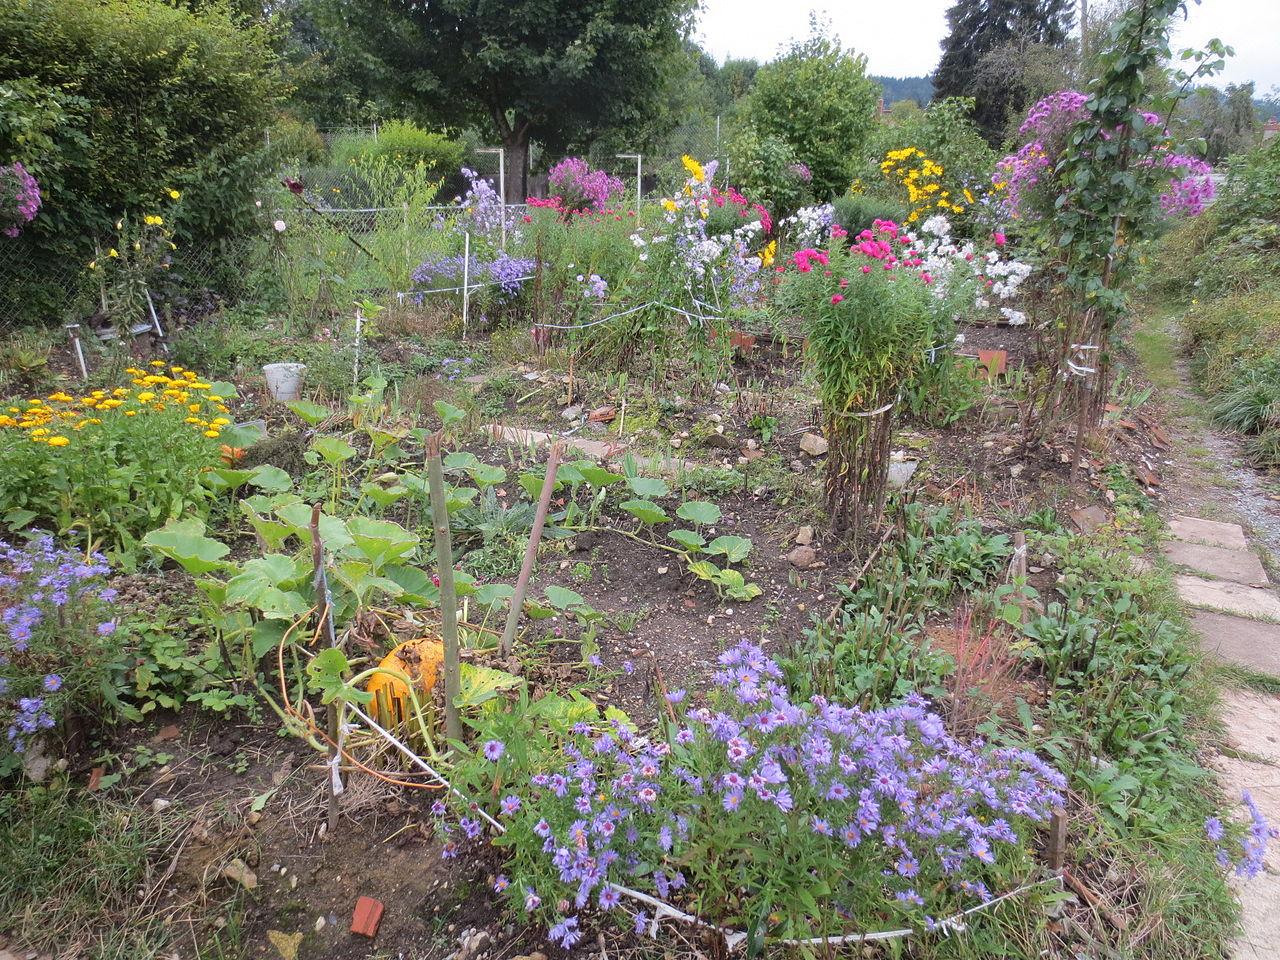 File:Jardin potager 002.JPG - Wikimedia Commons